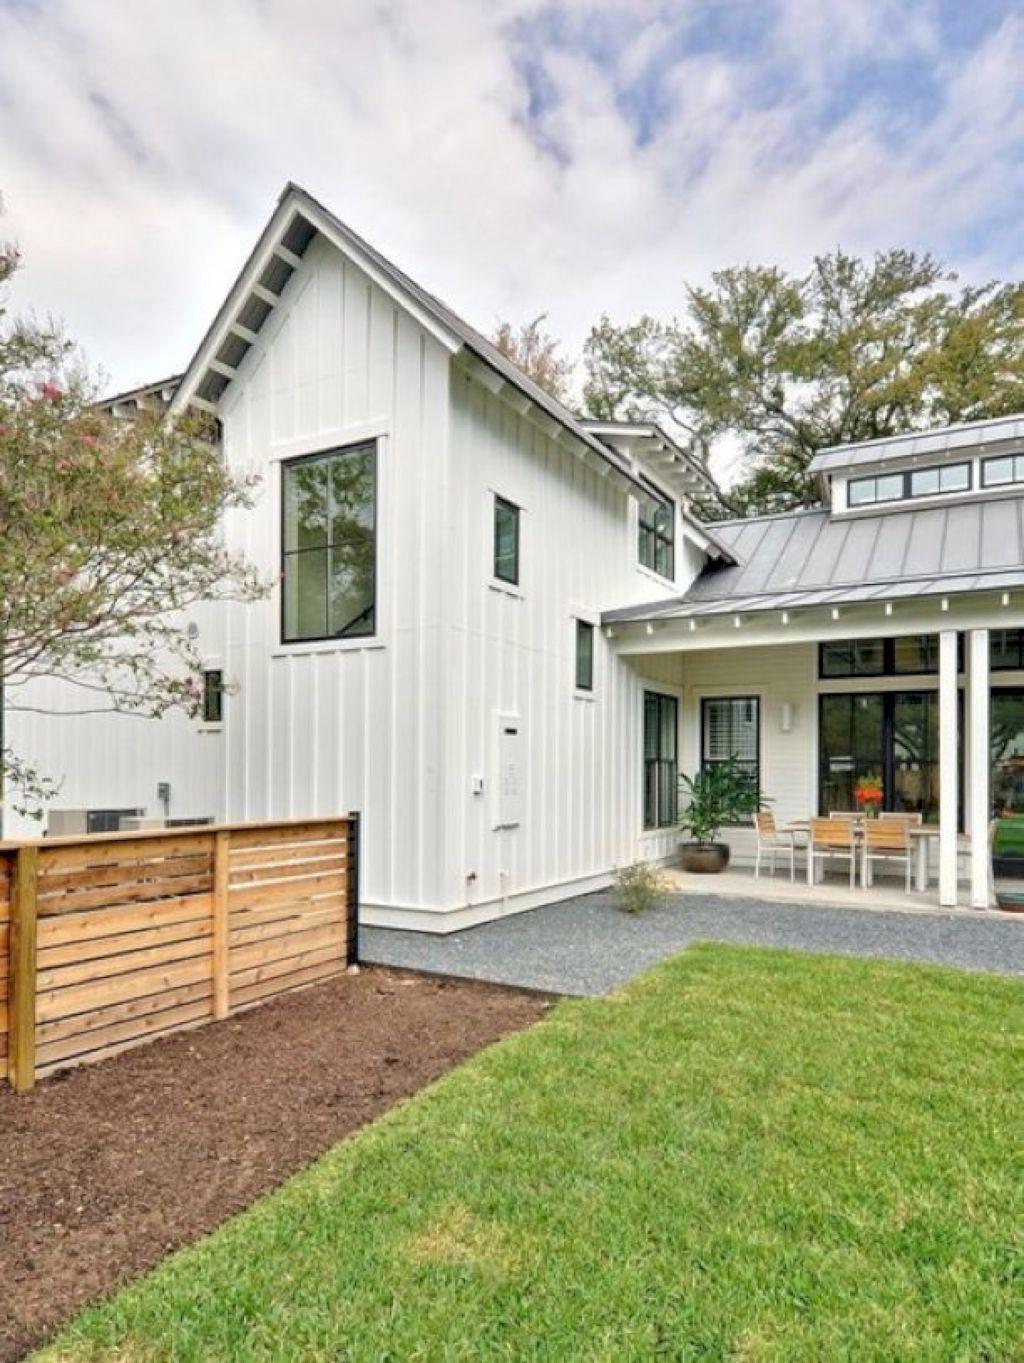 45 Modern Farmhouse Exterior Design Ideas | Modern farmhouse, Modern ...